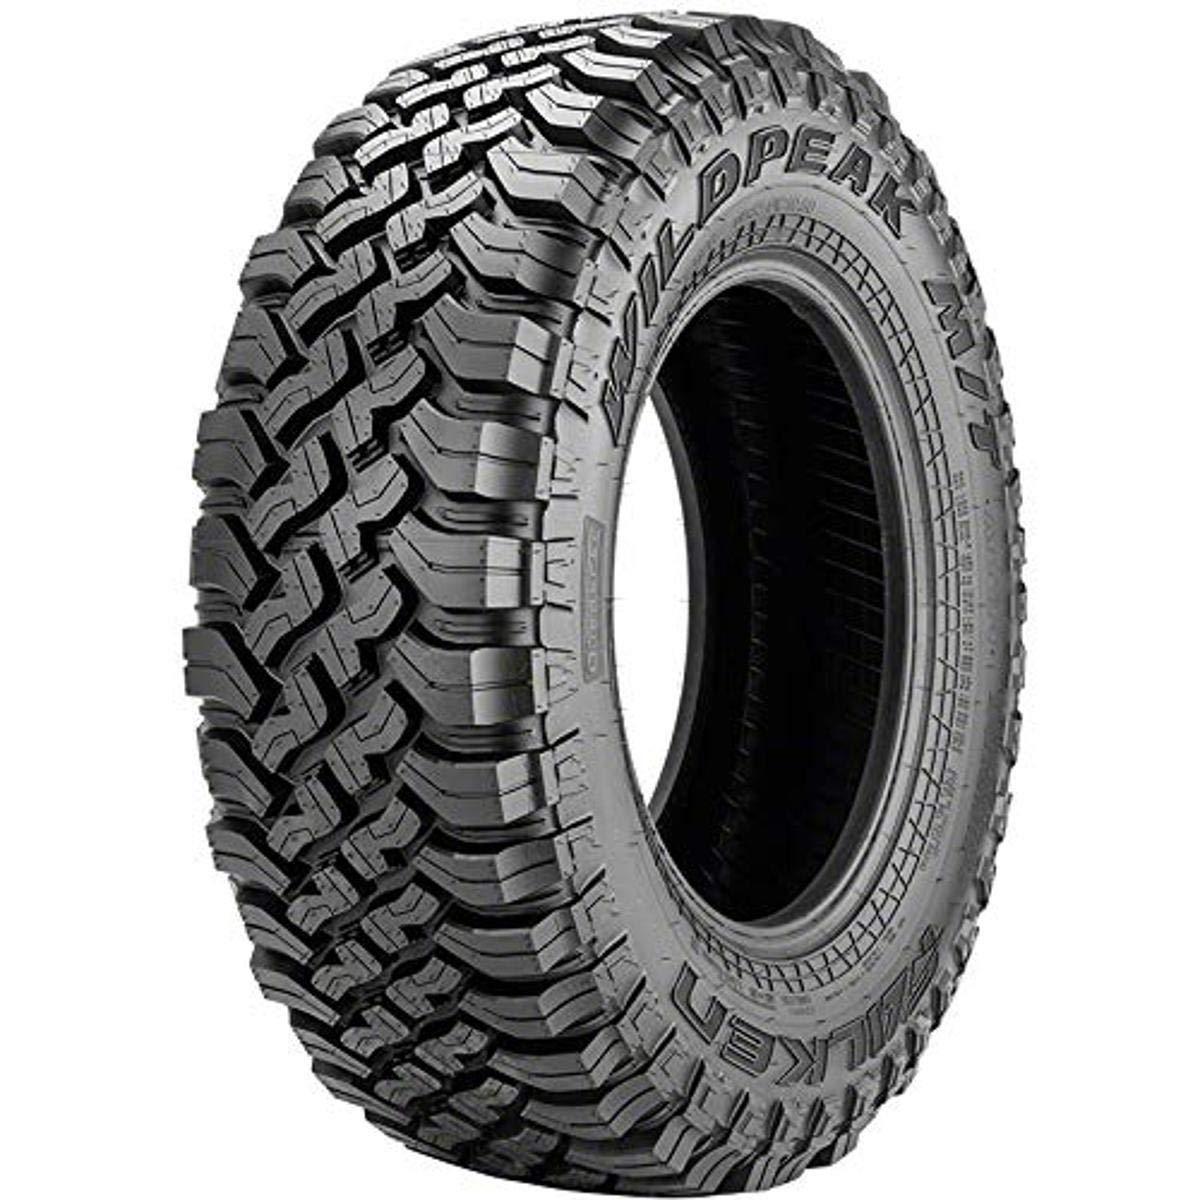 Falken Wildpeak MT01 All Terrain Radial Tire - 35x12.50R20 121Q